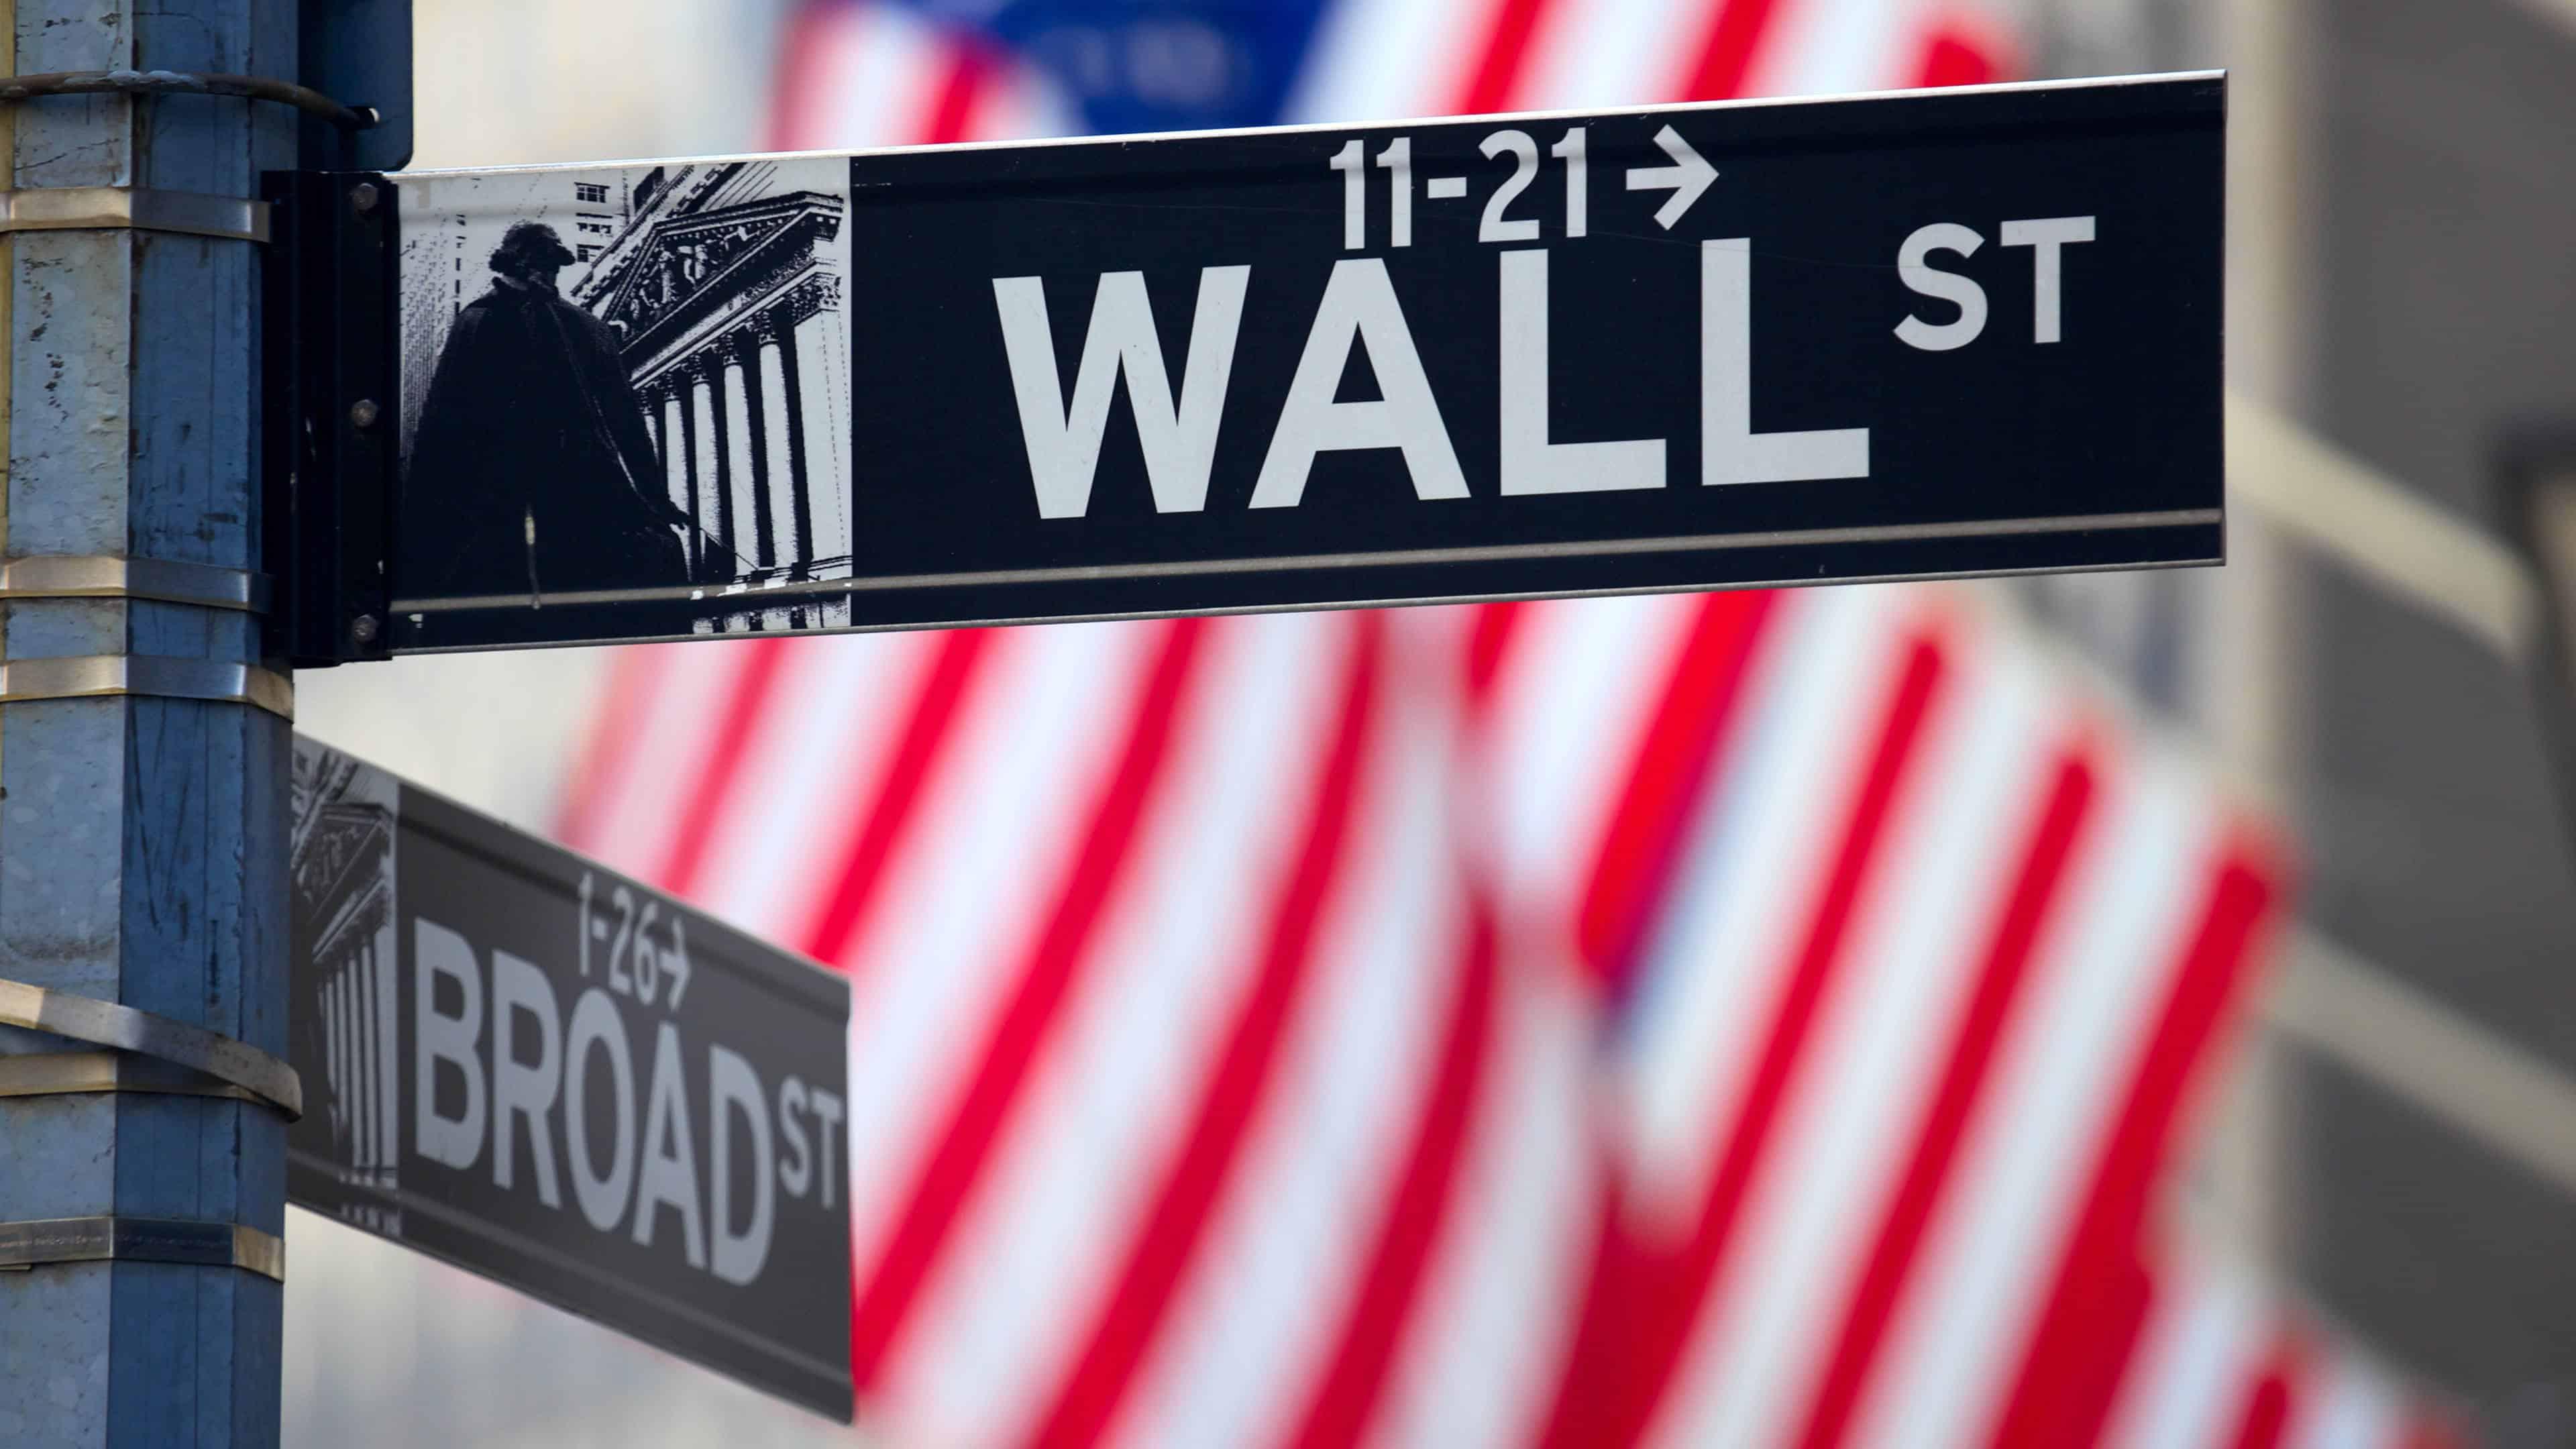 wall street sign uhd 4k wallpaper